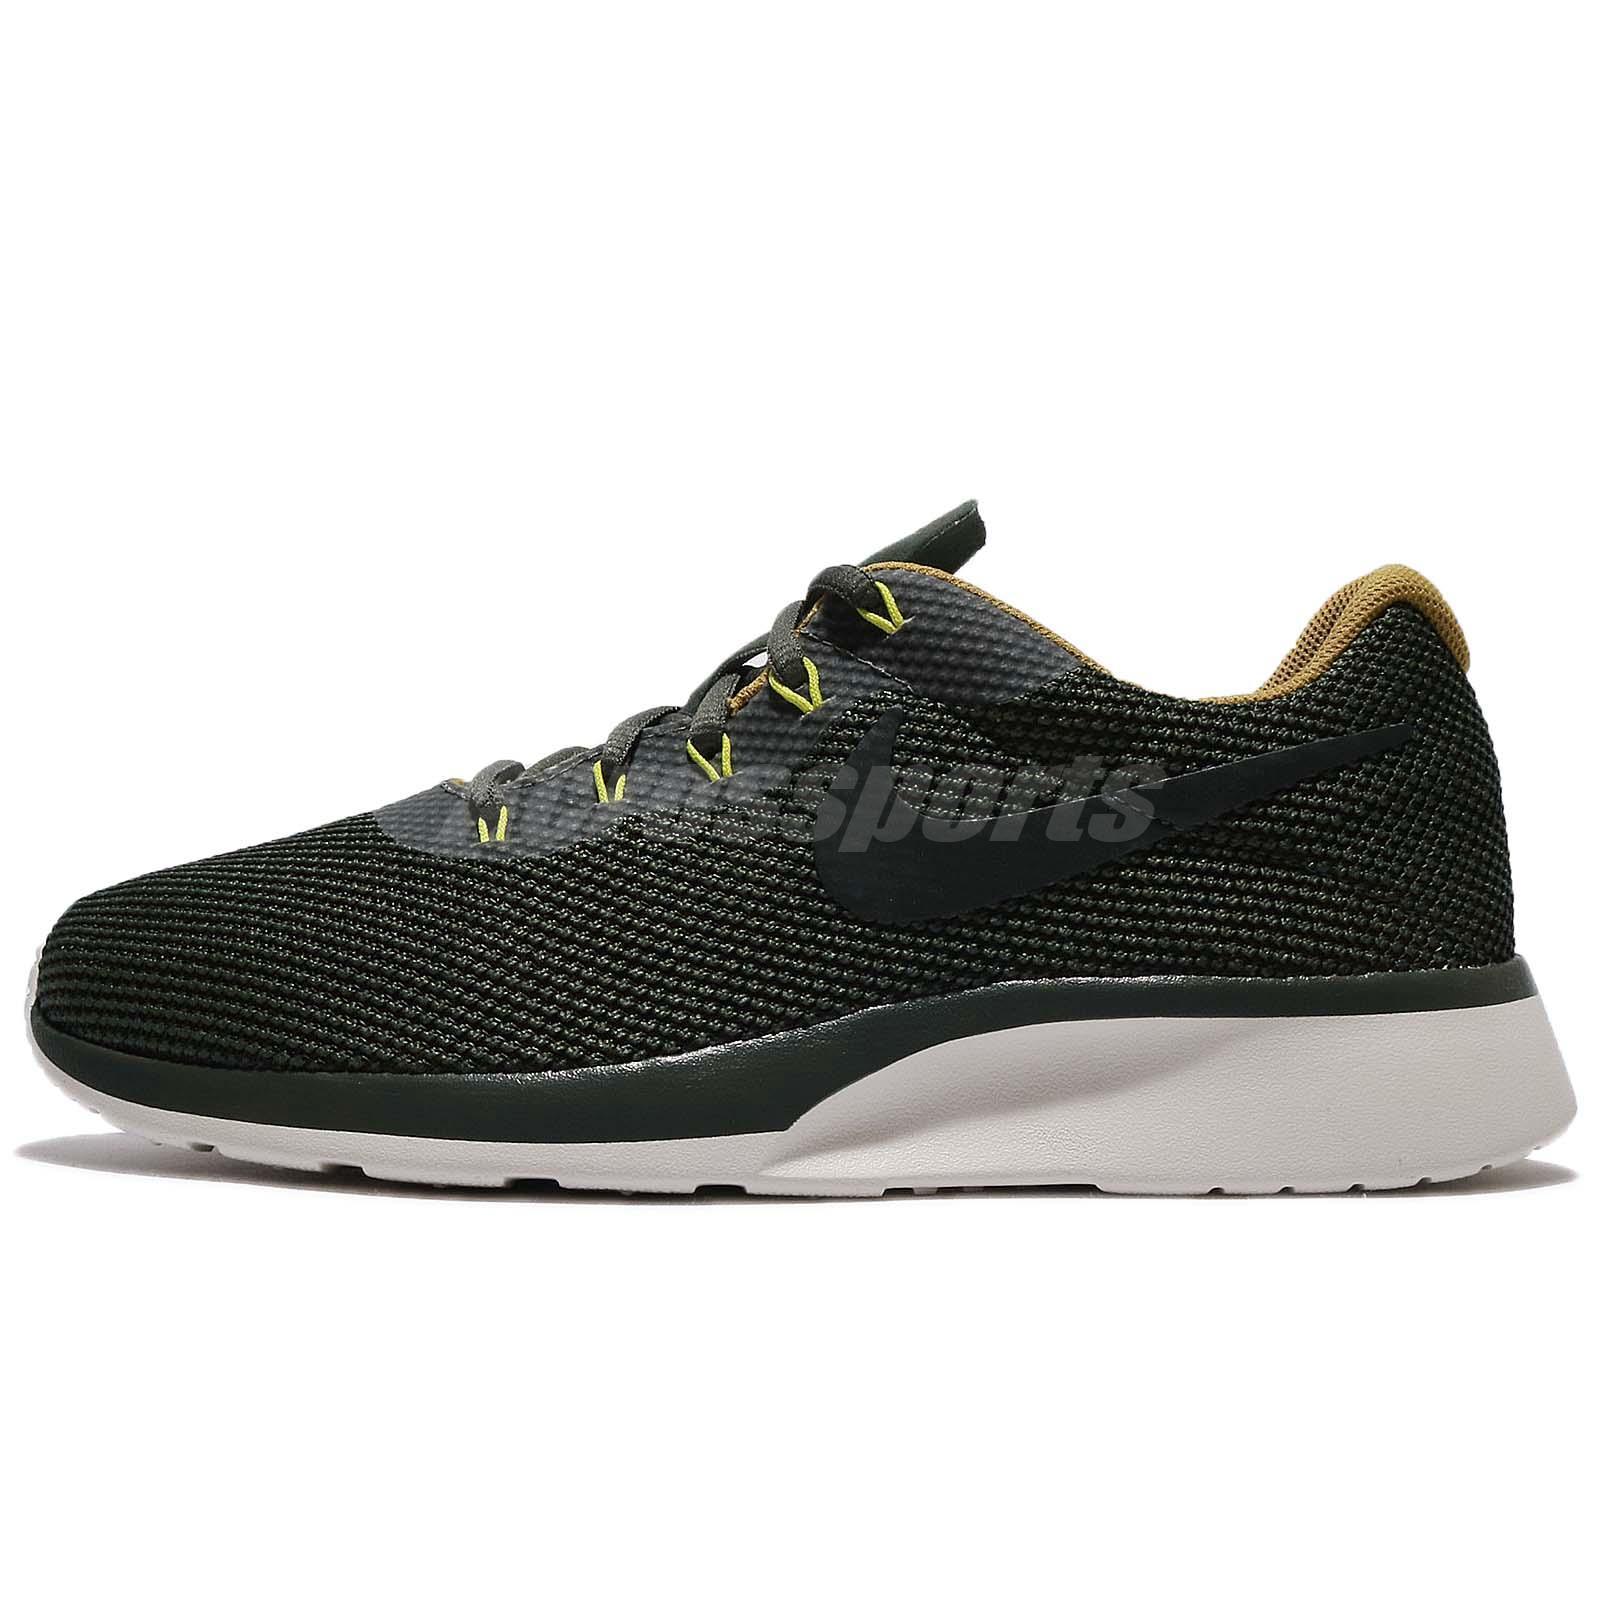 half off ae336 2c29b ... usa nike tanjun racer vintage outdoor green men running shoes sneakers  921669 300 84af1 c4620